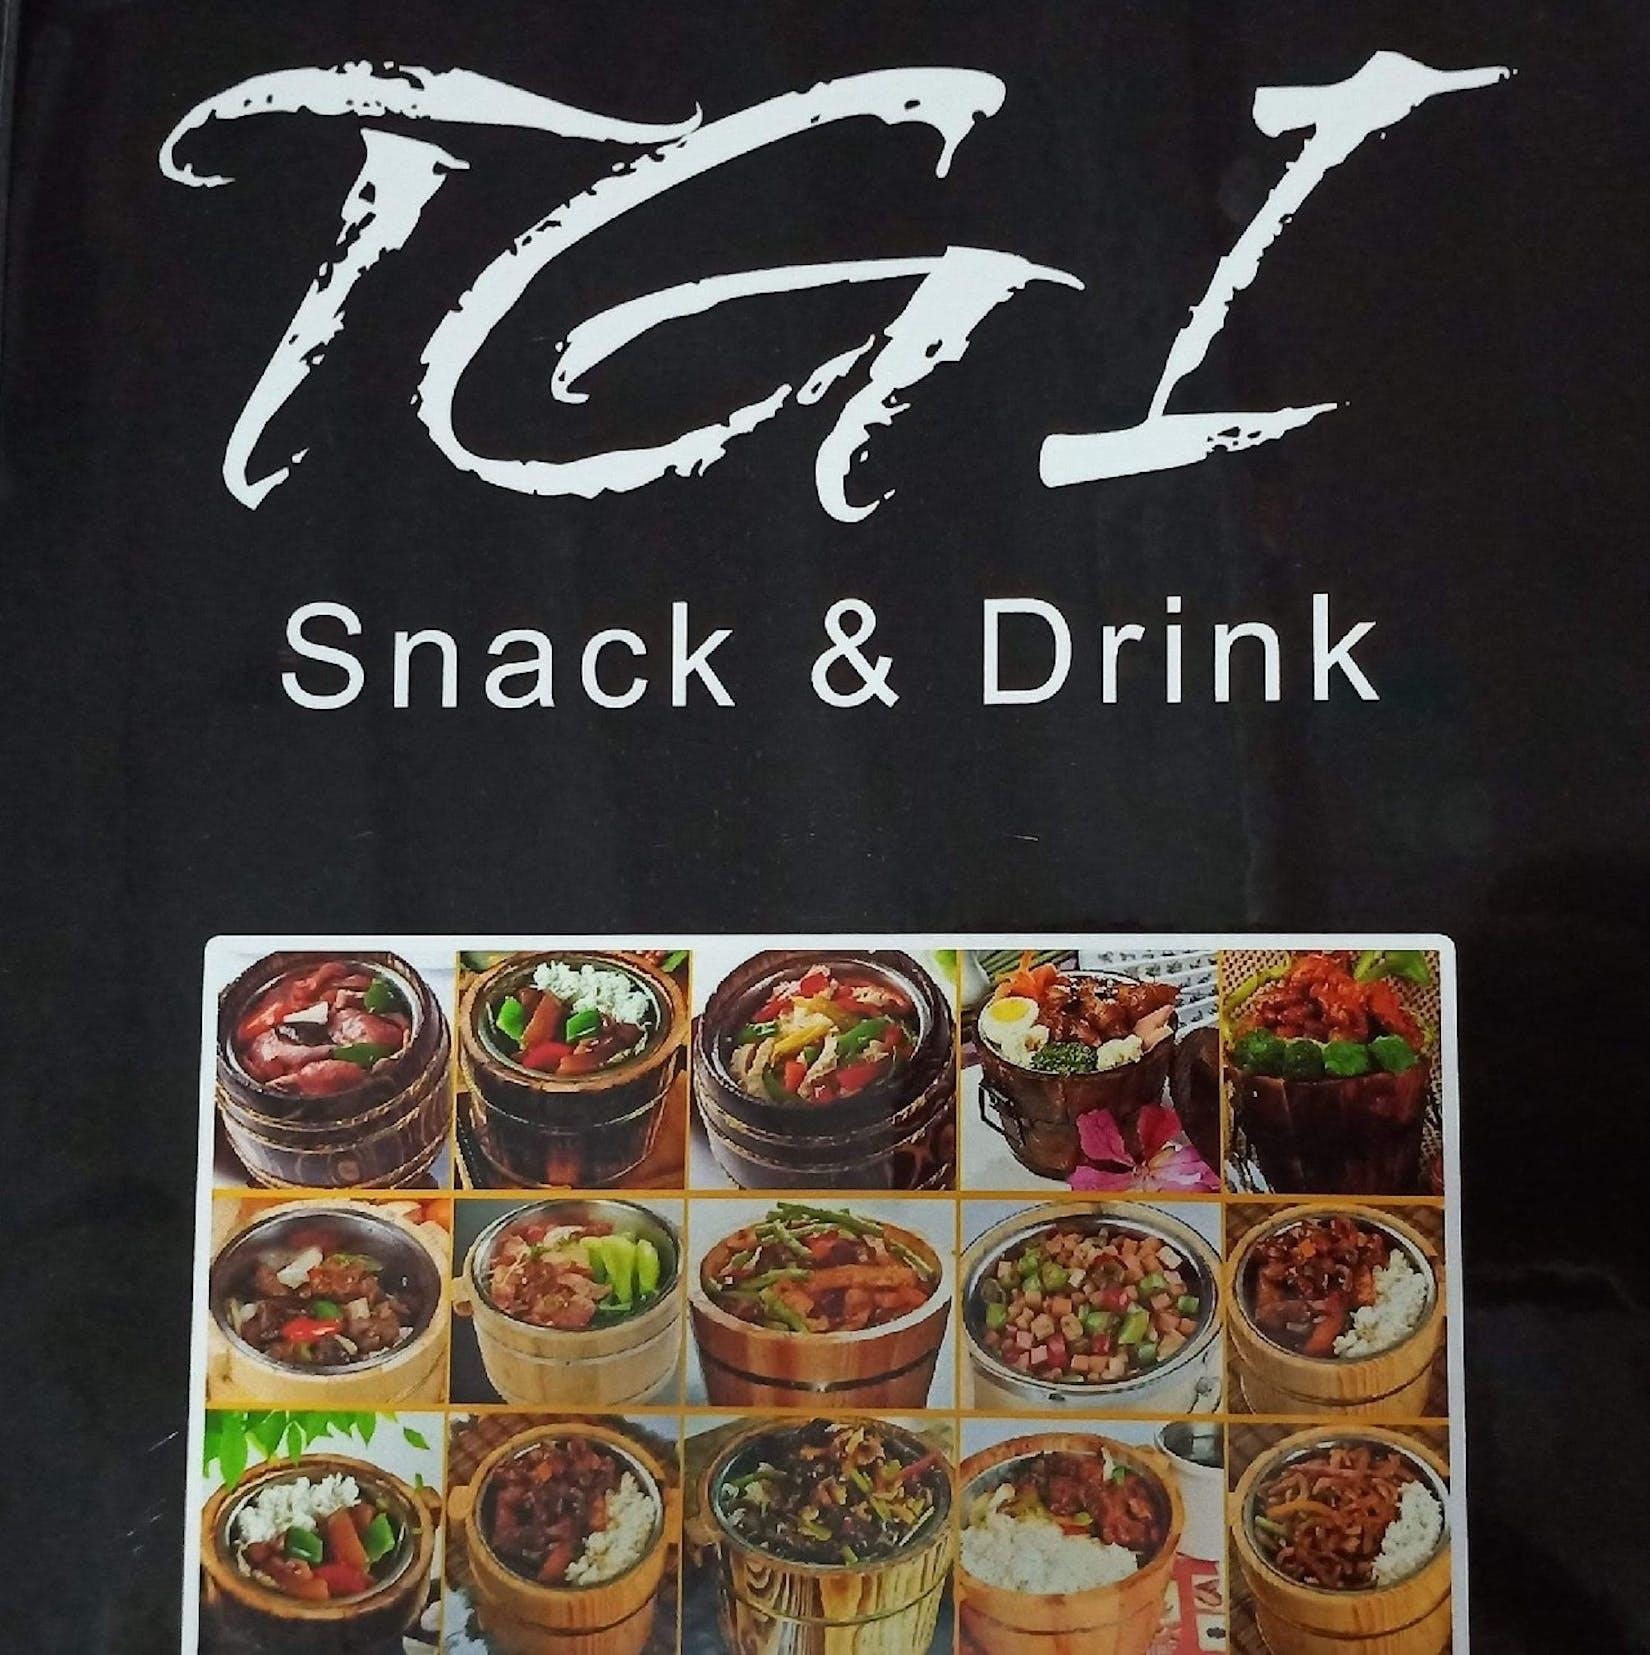 TGI Snack & Drink | yathar